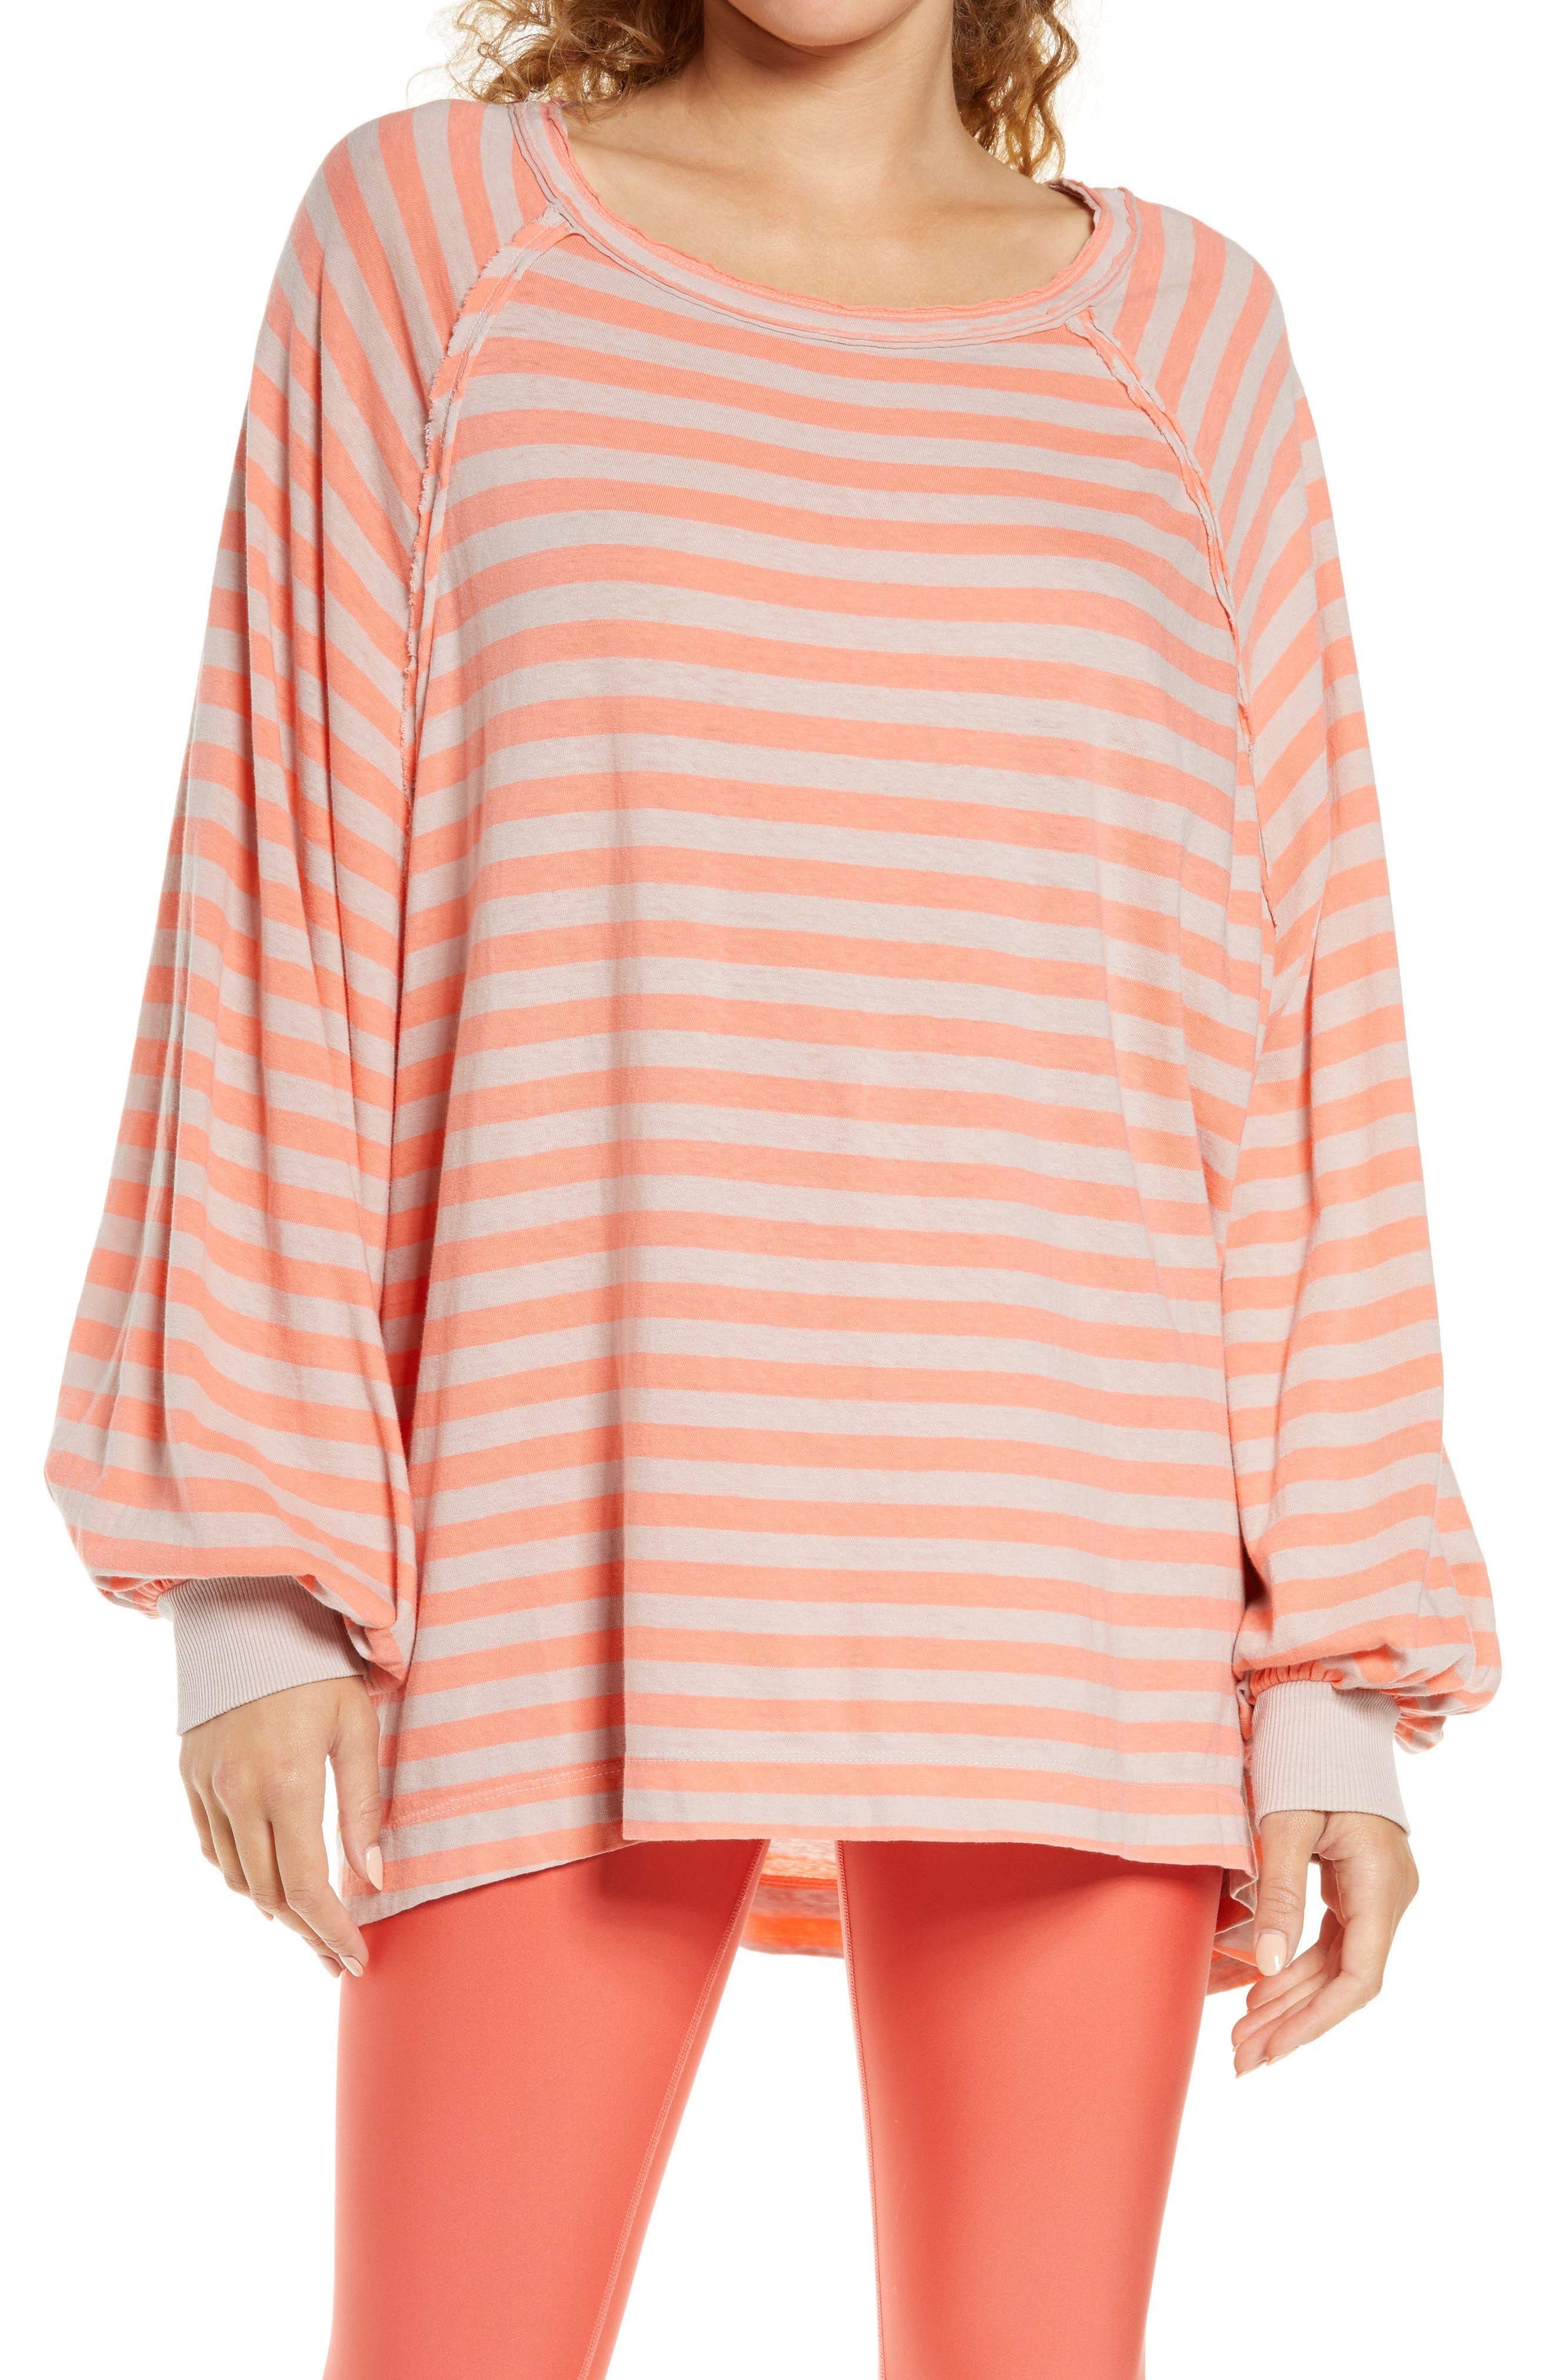 She's Everything Stripe Shirt